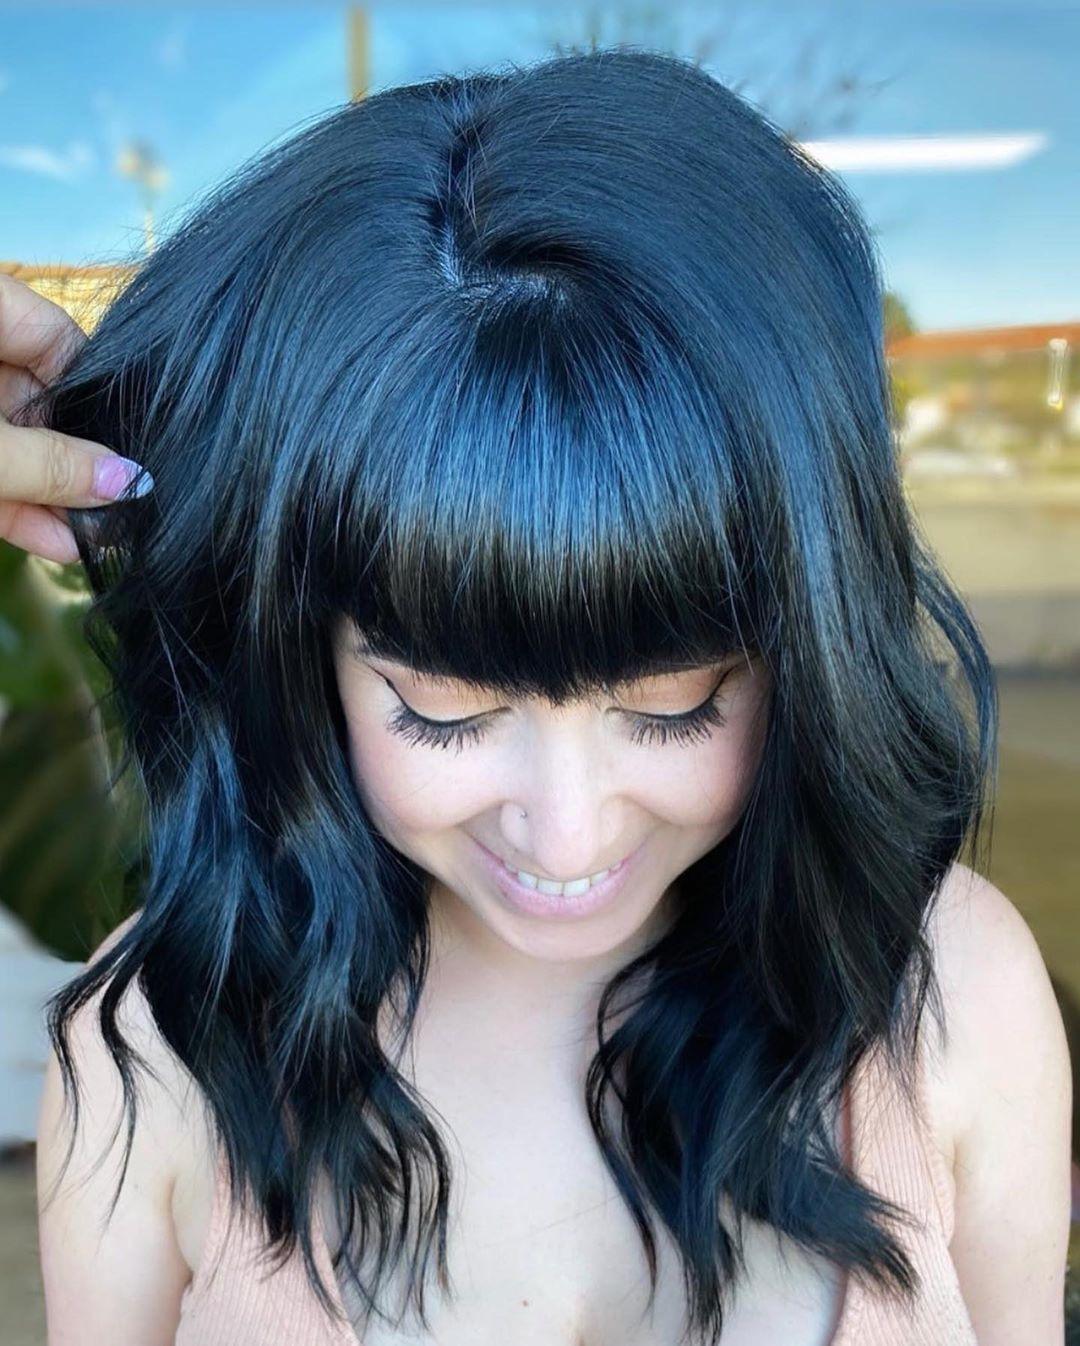 "Kenra Professional on Instagram: ""Blue Black anyone? SWIPE ⬅️to watch the full tutorial! ⠀ @mirellamanelli used @kenraprofessional Monochrome 1BL+ ⠀ ⠀ Little tip: This will…"""